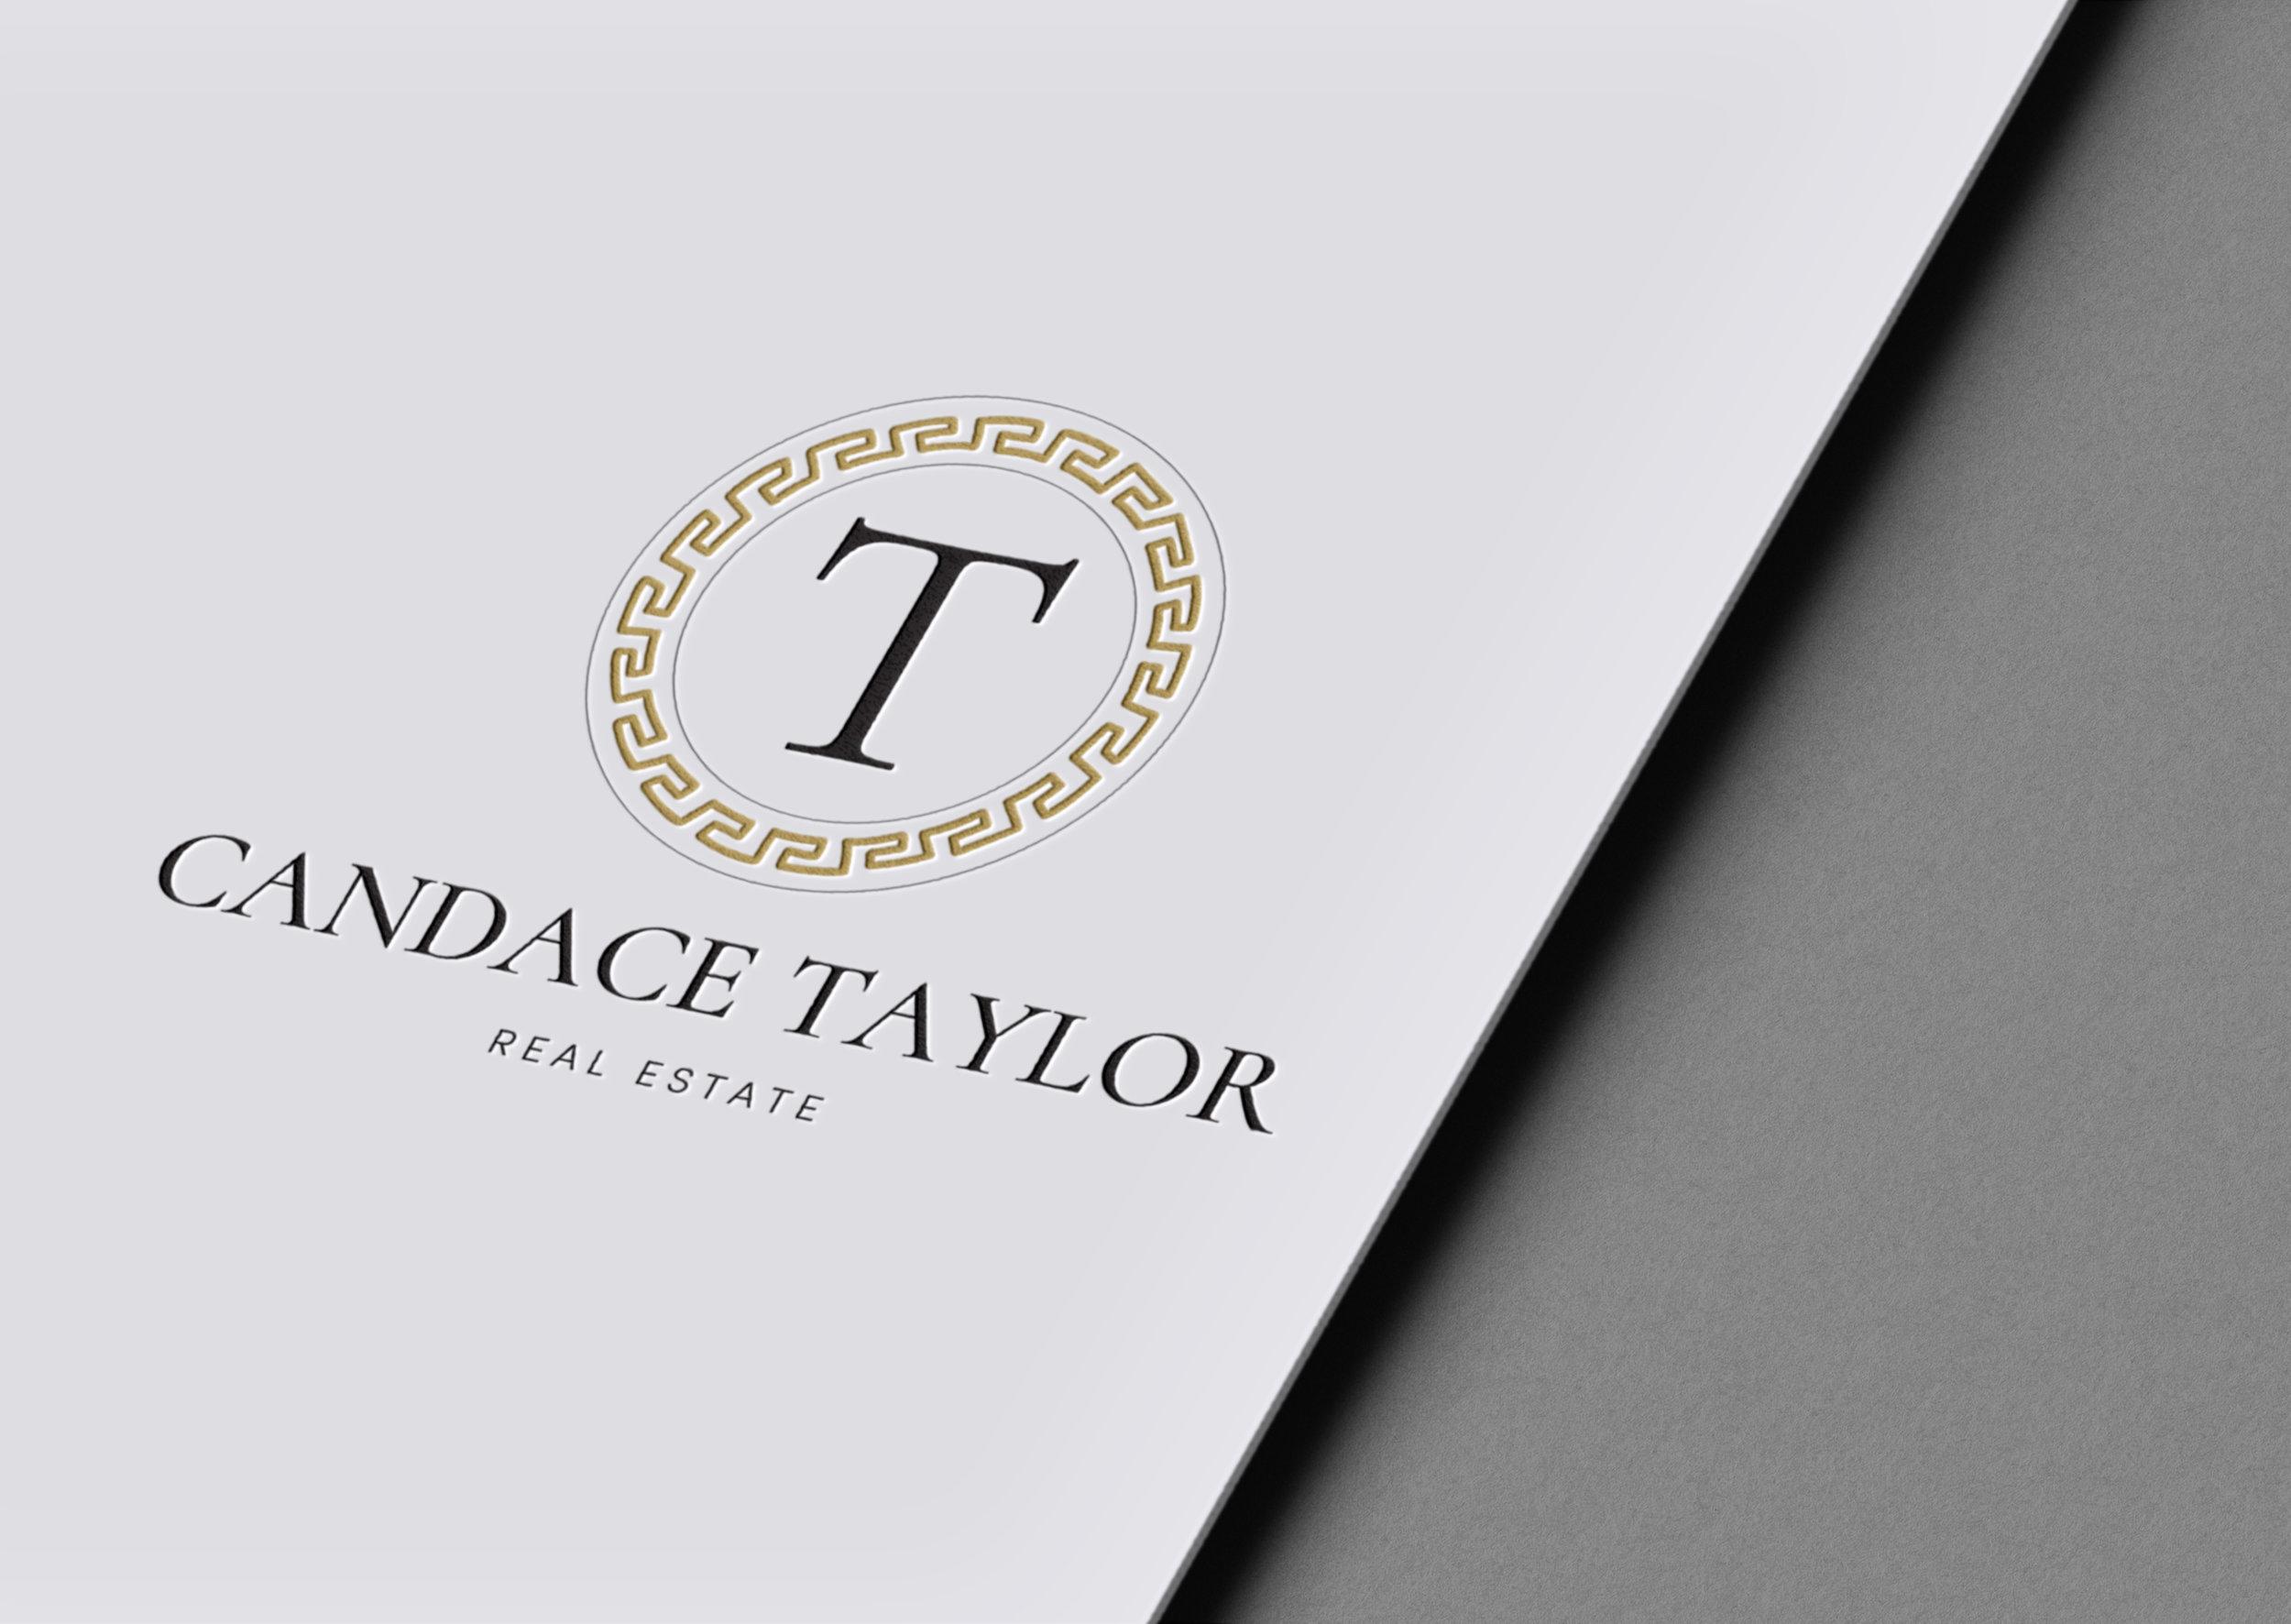 Candace Taylor (1).jpg